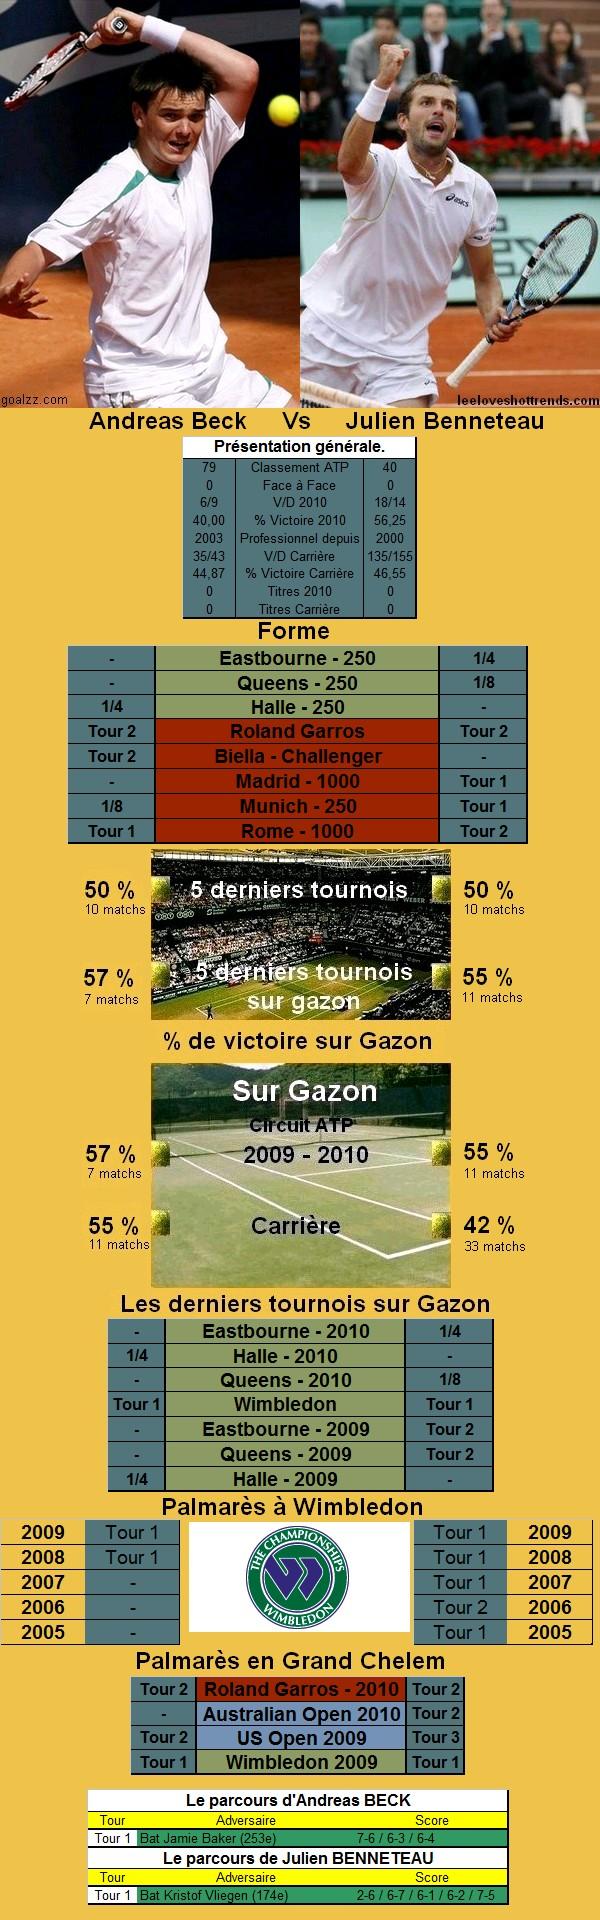 Statistiques tennis de Beck contre Benneteau à Wimbledon